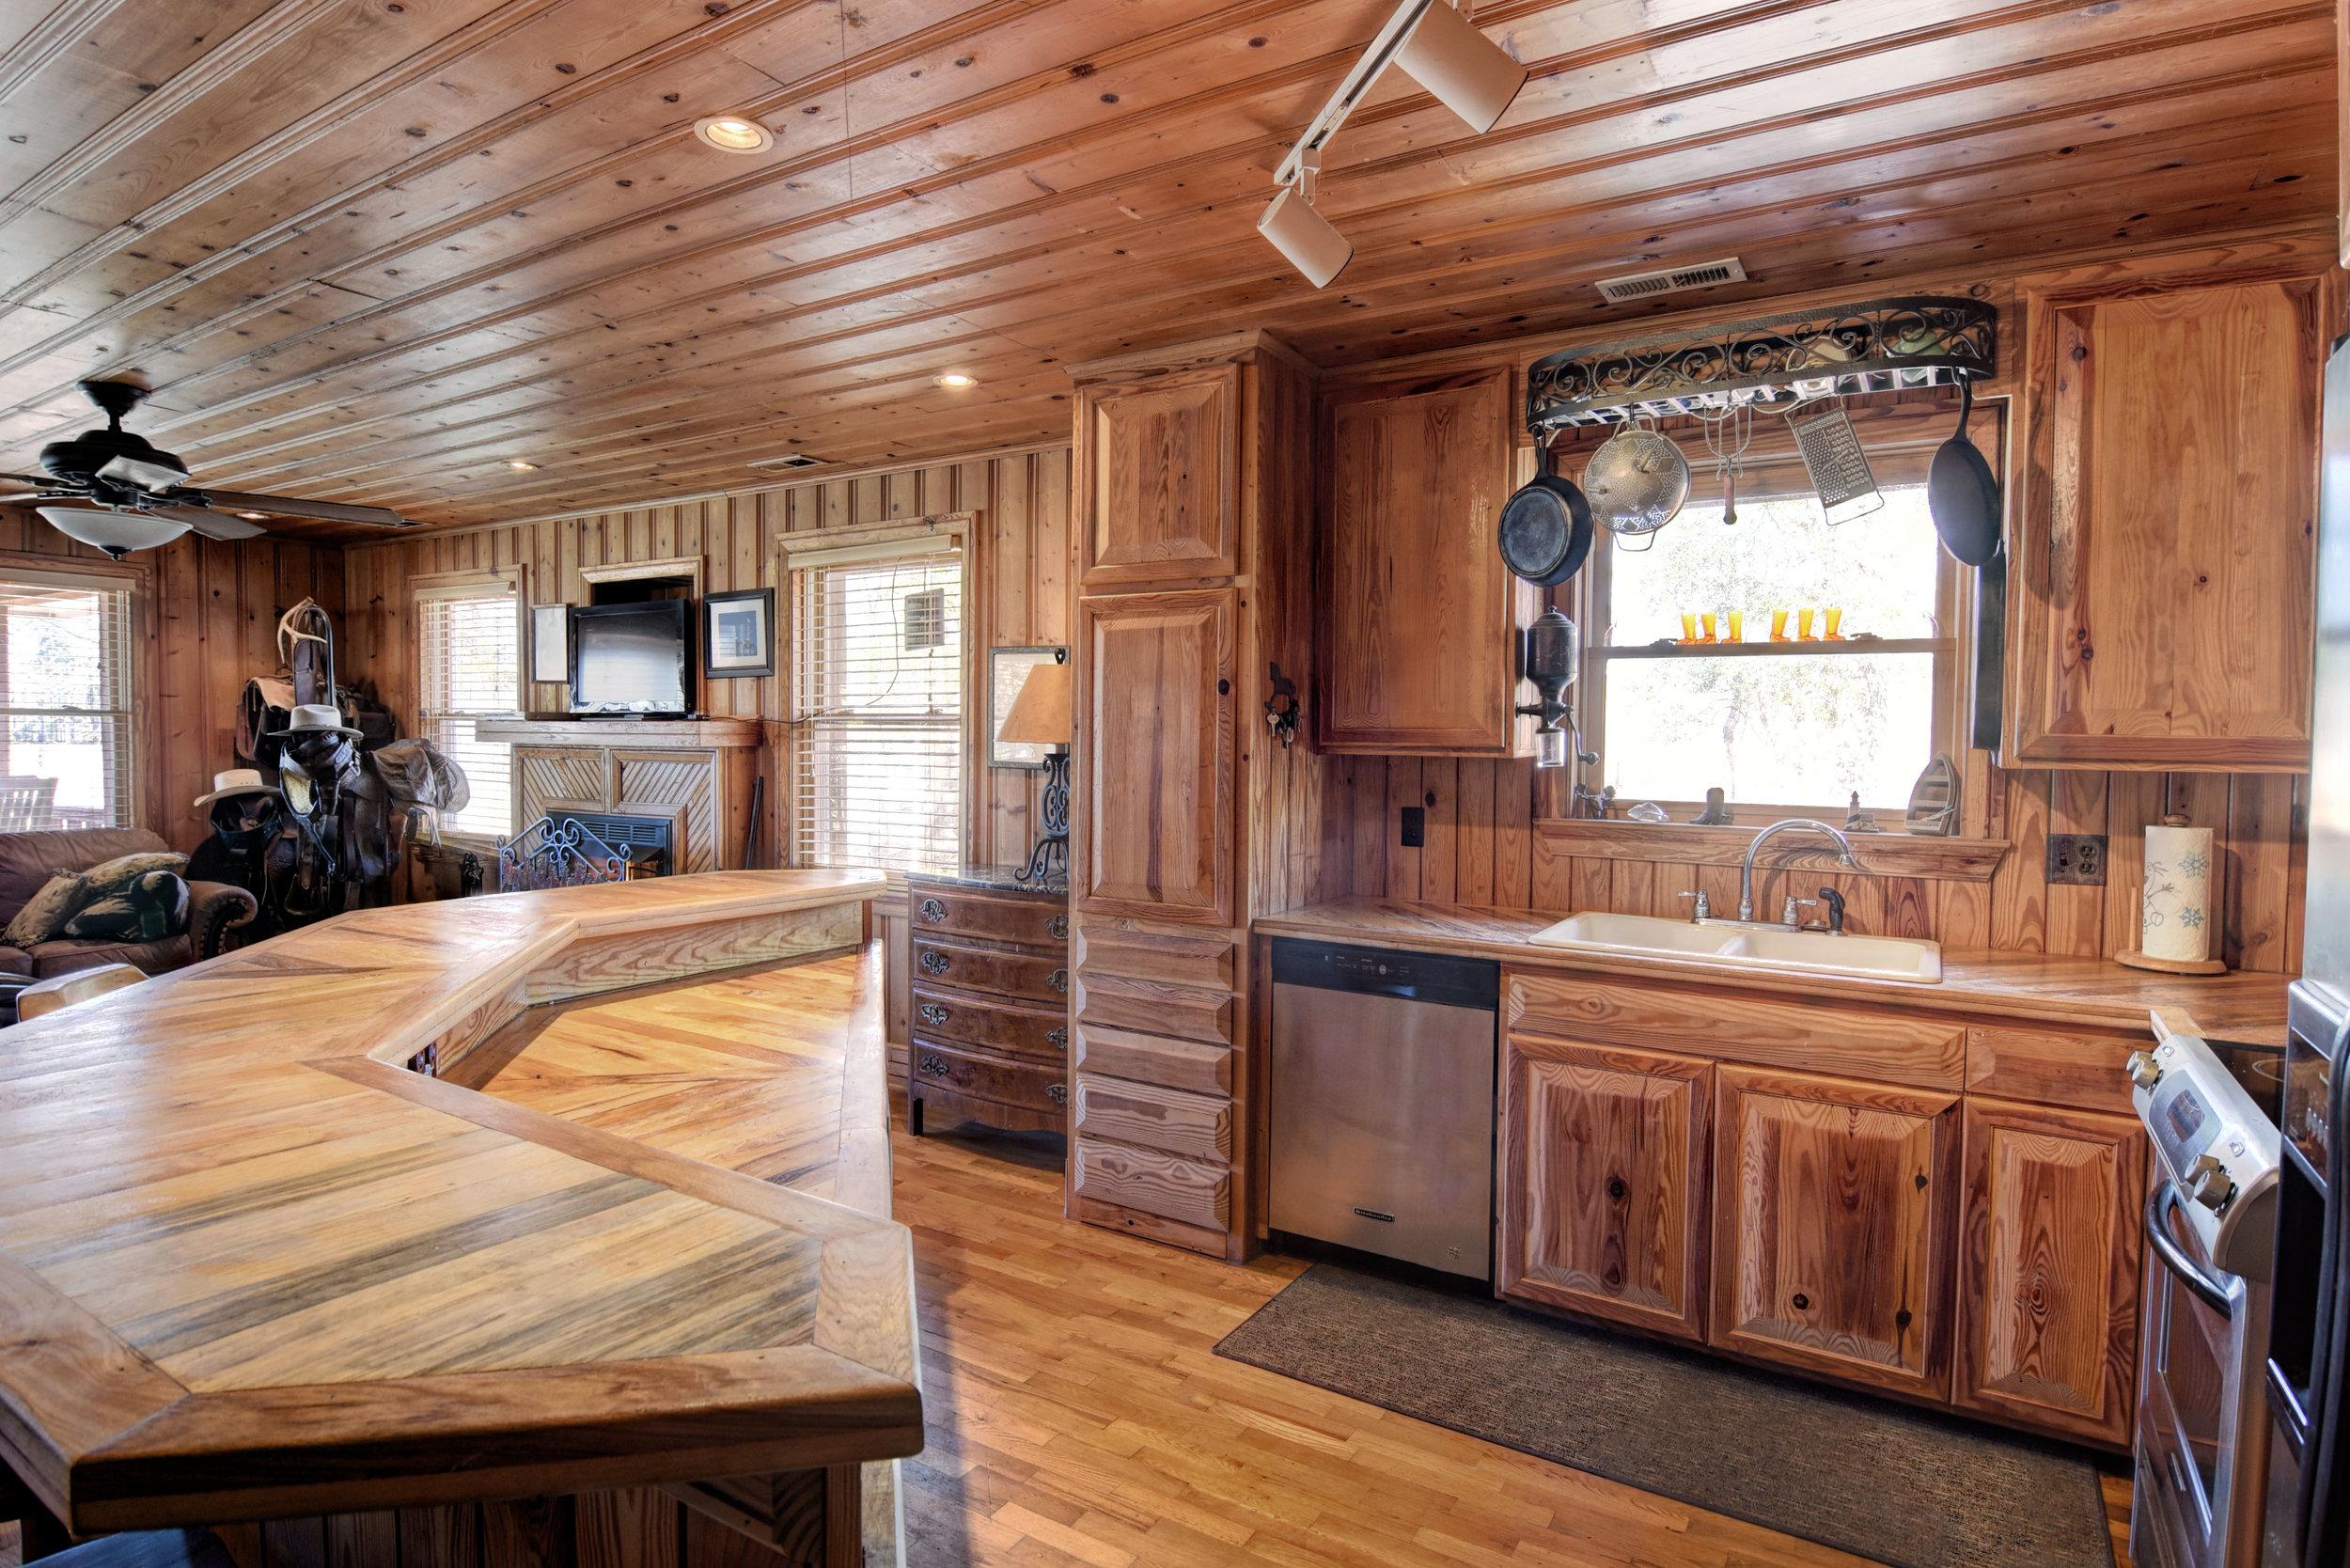 1395 Deadwood Trail SE-print-011-9-DSC 8200 1 2-4200x2803-300dpi.jpg